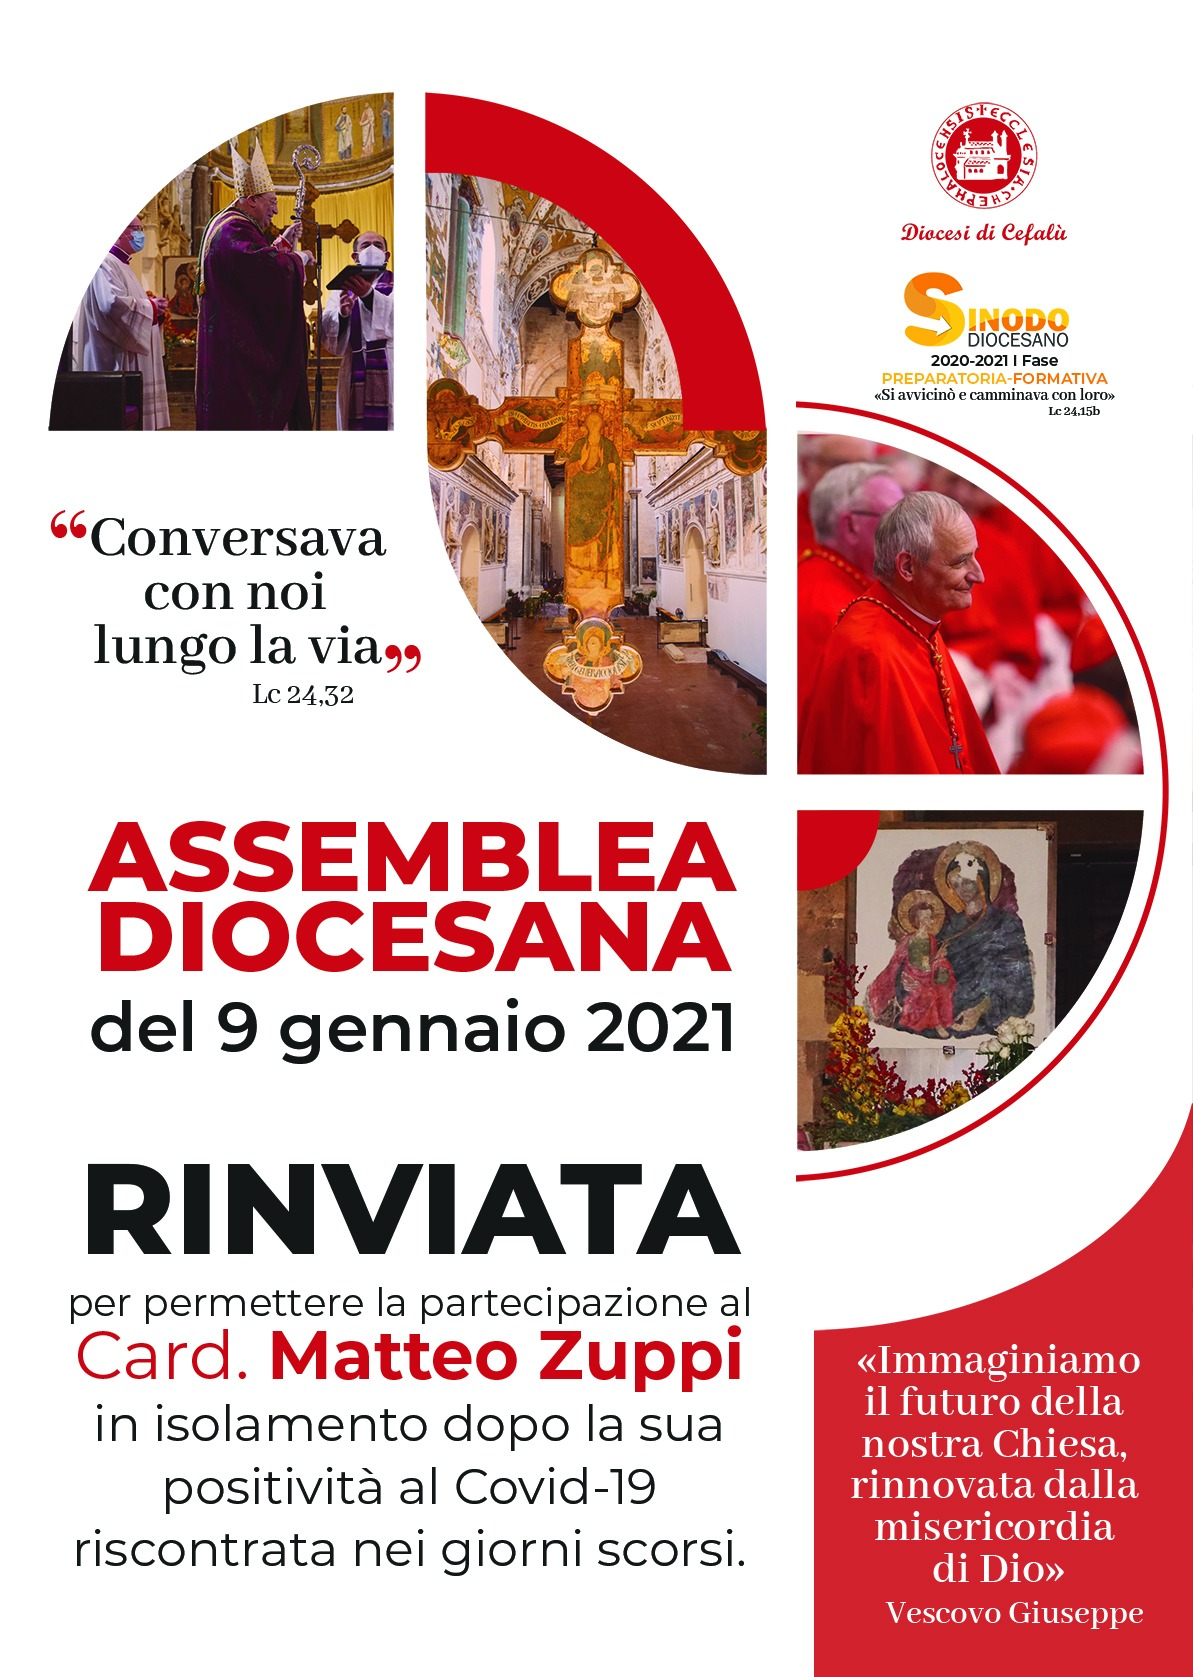 assembleadiocesana2021rinviata-1609752172.jpg